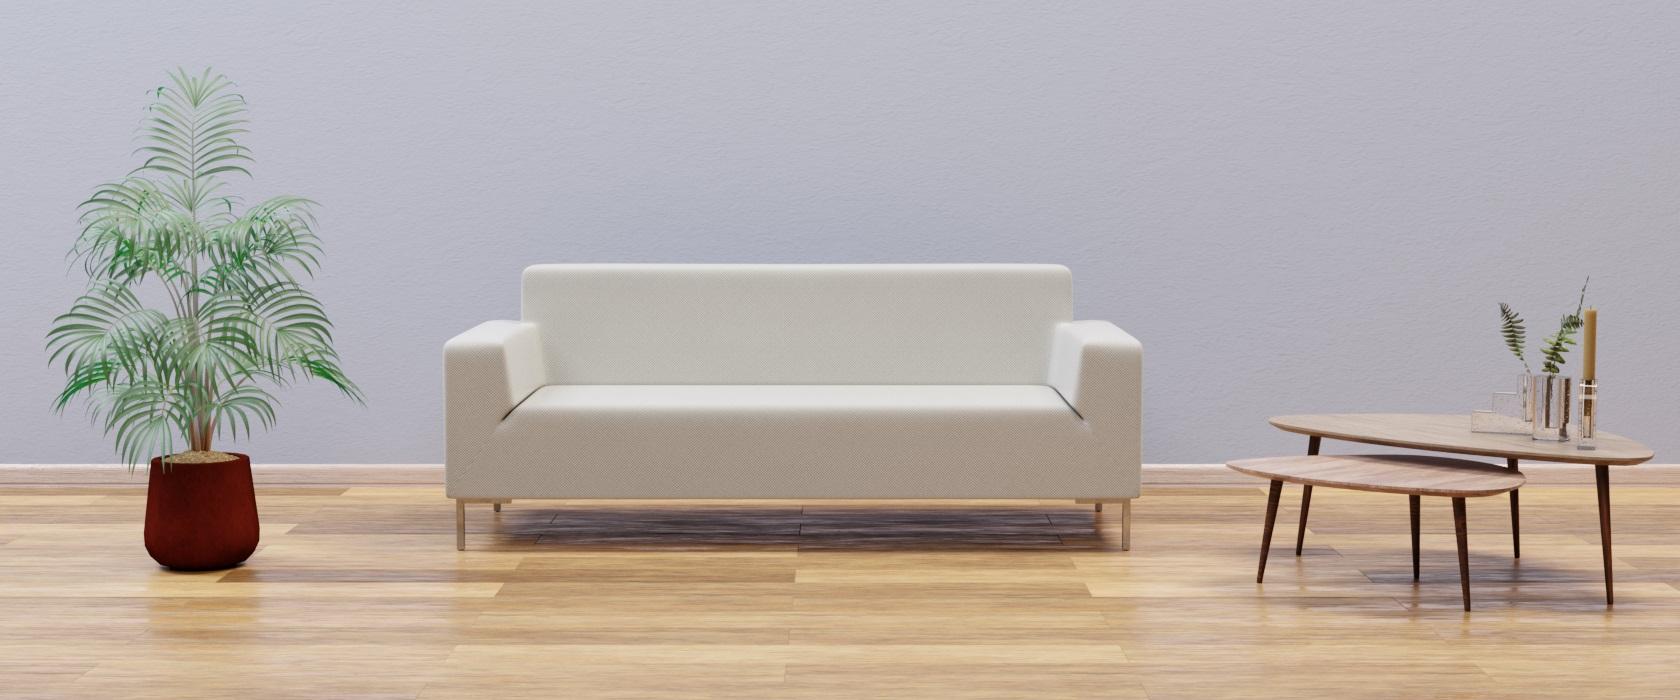 Двухместный диван Livorno Classic - Фото 2 - Pufetto